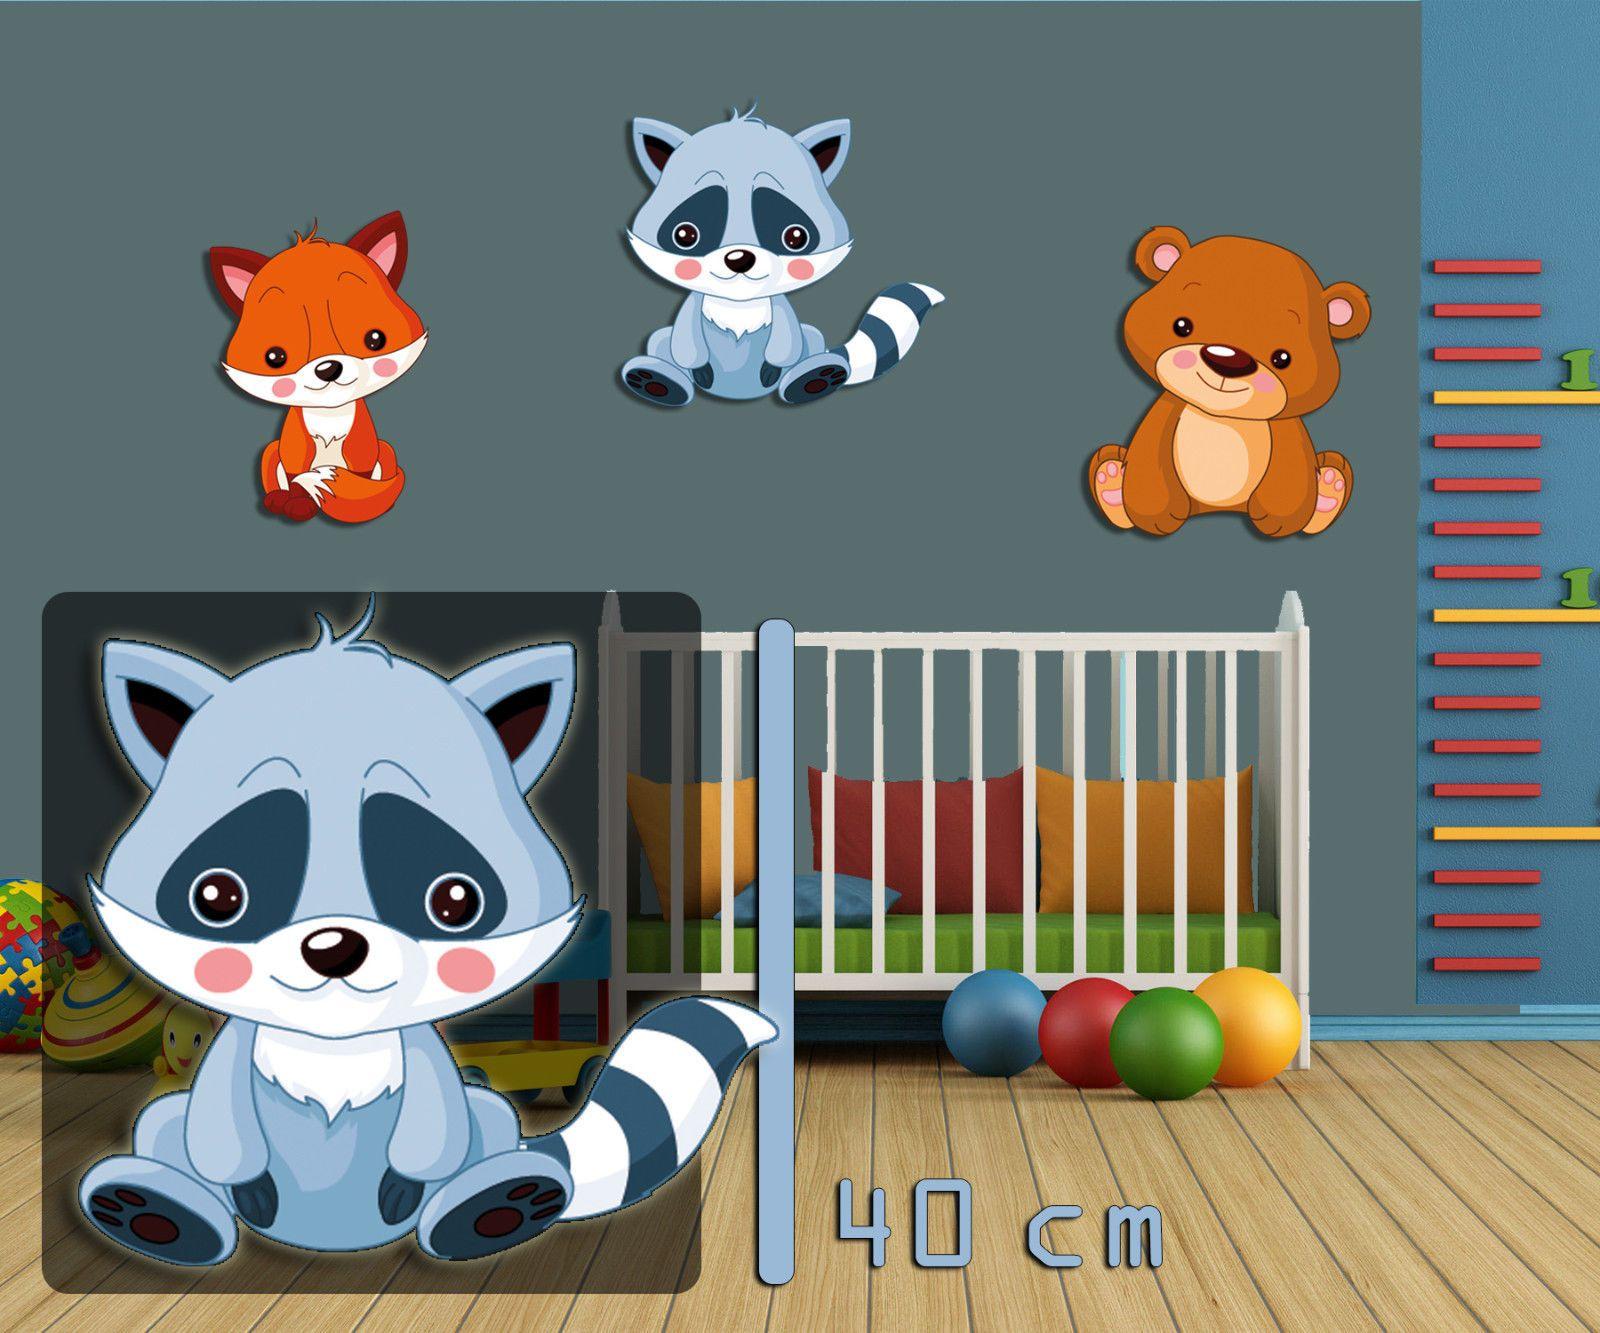 Wandbild Kinderzimmer Waschbär 40 cm, Tiermotiv Waldtier